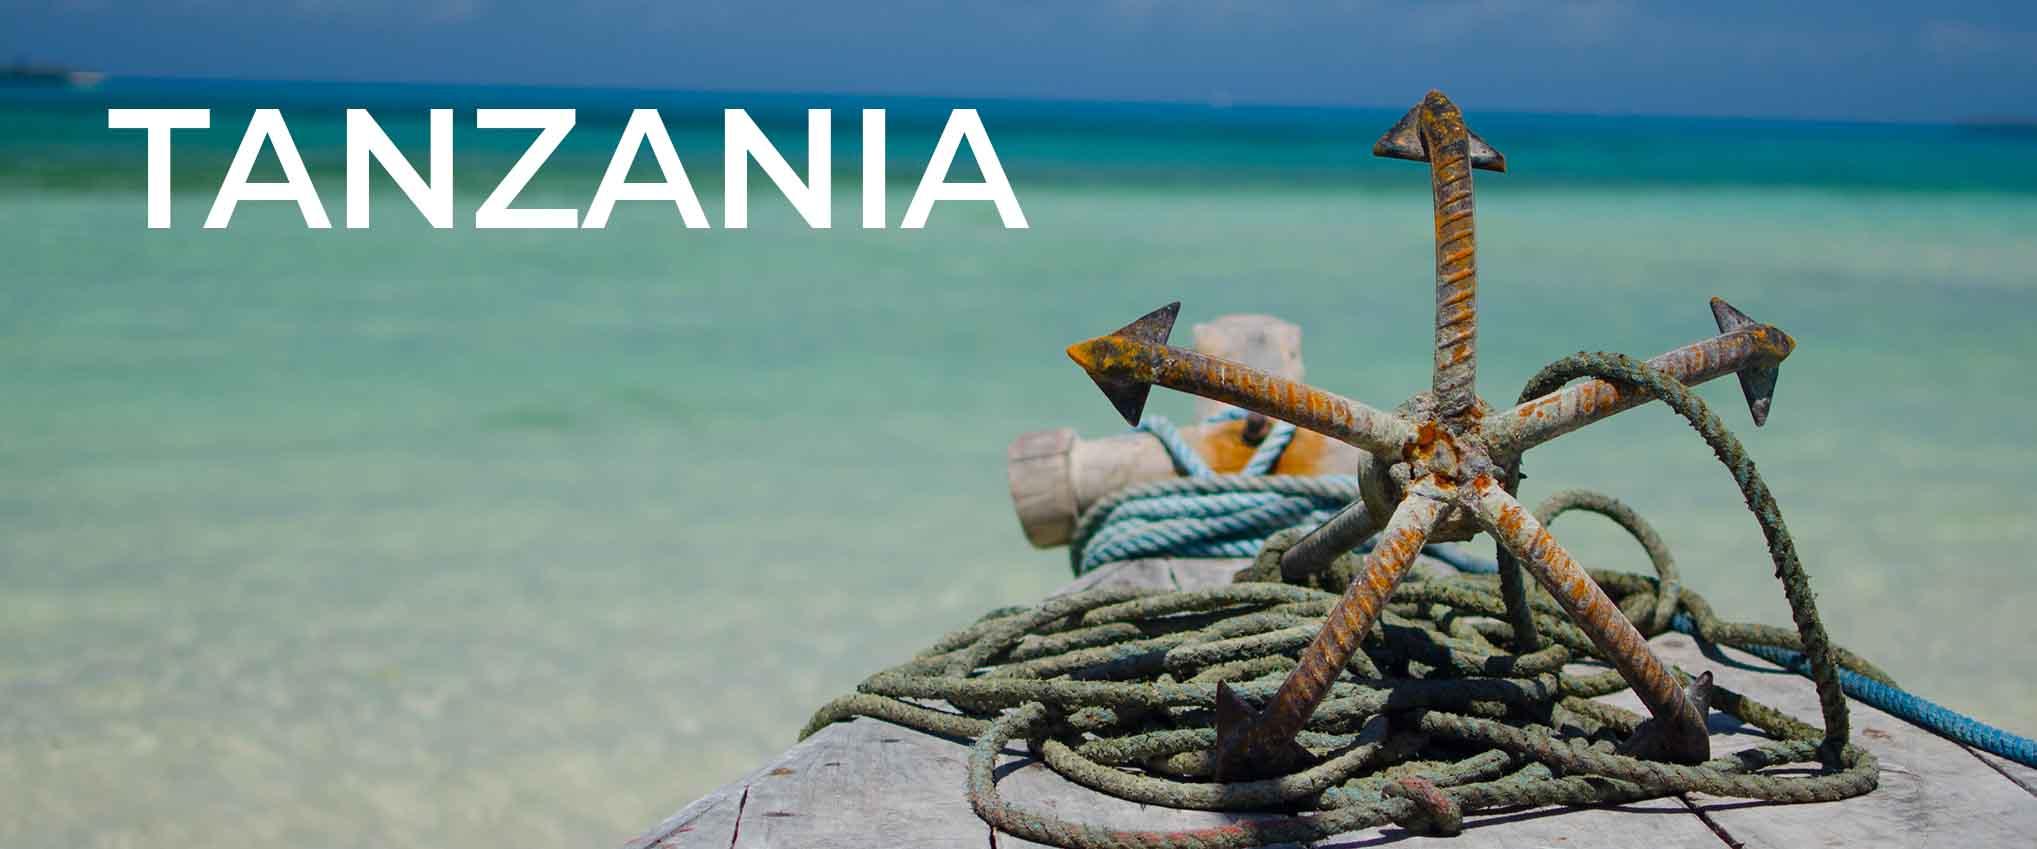 Tanzania-page-banner